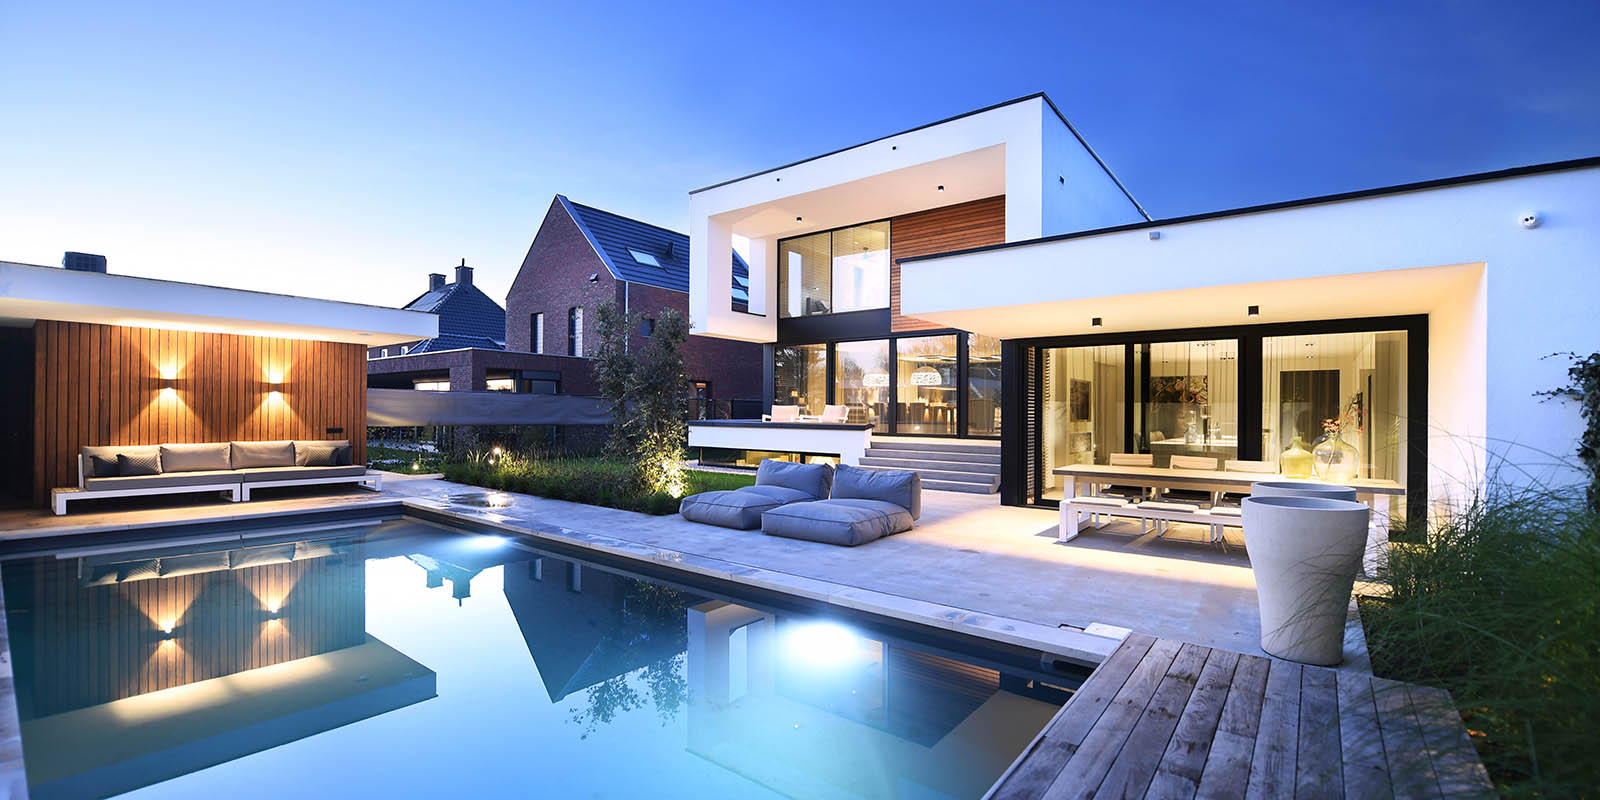 Ultramodern | Bruis Architecten, the art of living